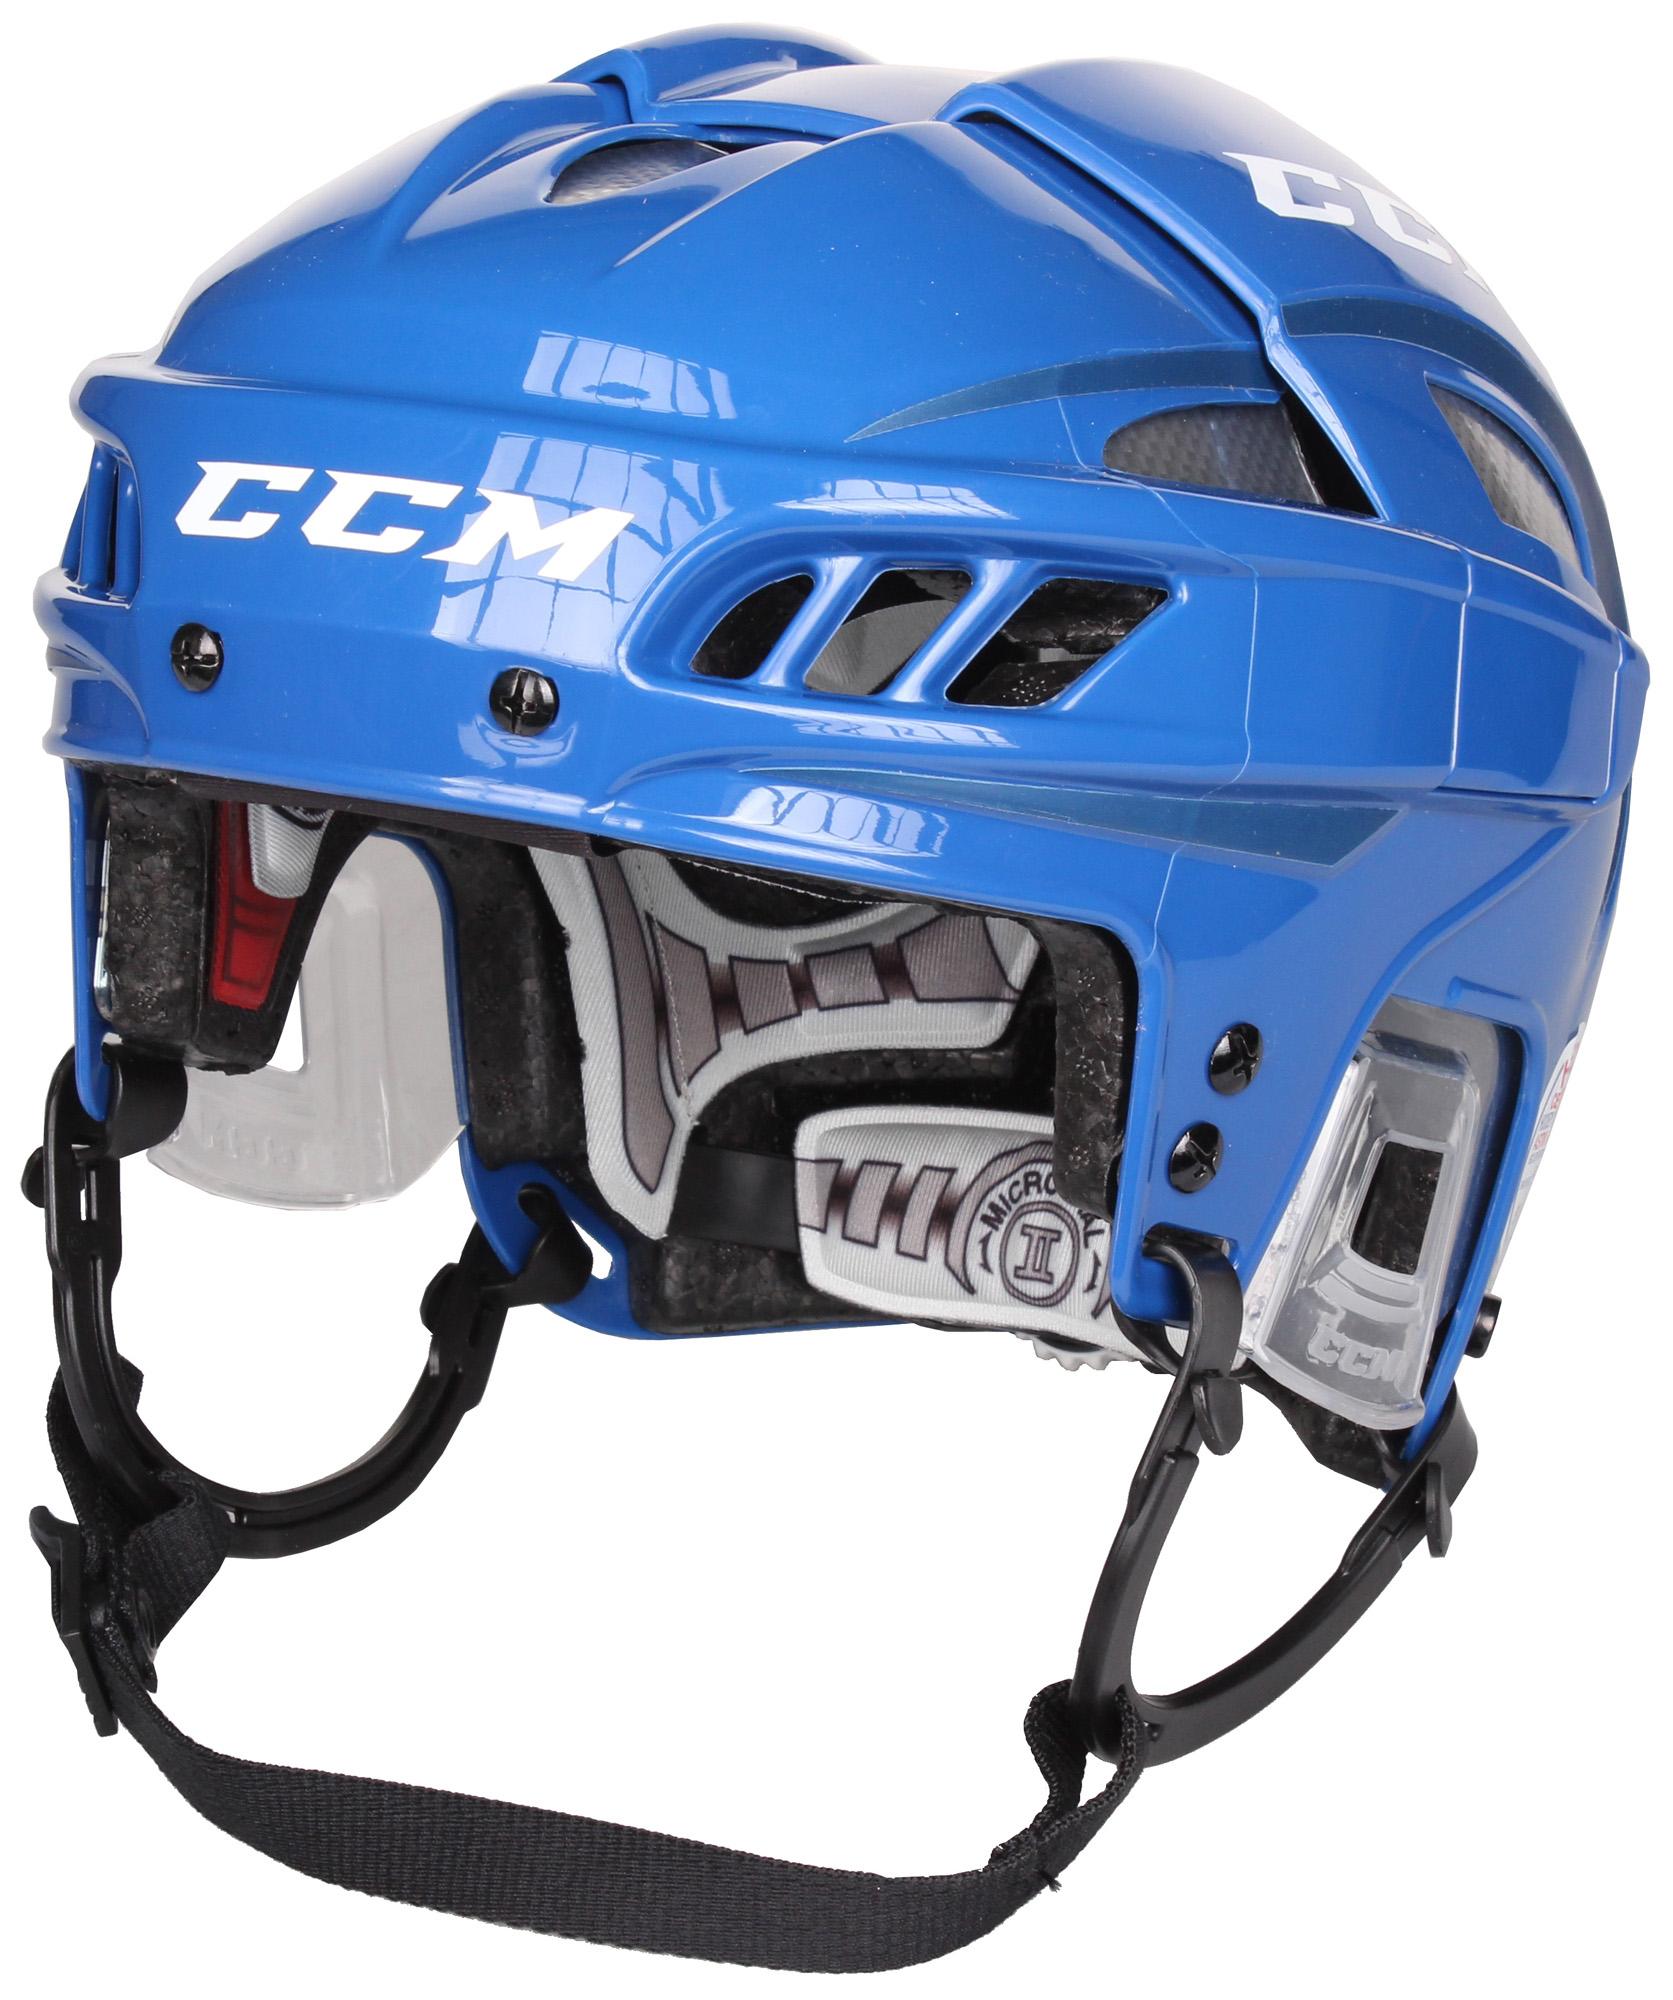 CCM FitLite hokejová helma - modrá